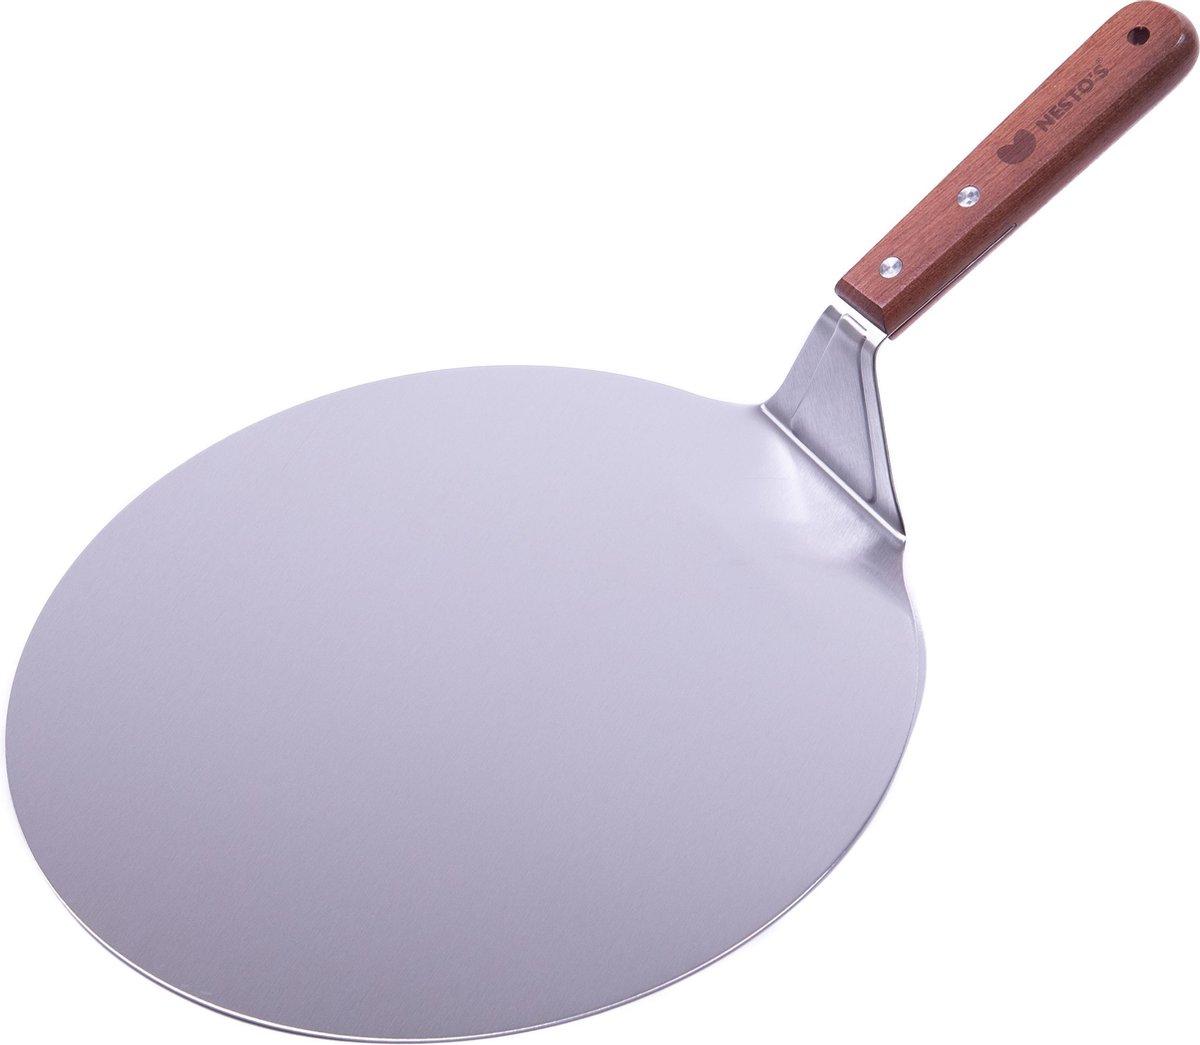 Nesto's - Pizzaschep - pizzaspatel - pizza schep - spatel - Voor BBQ en Oven - 26 cm